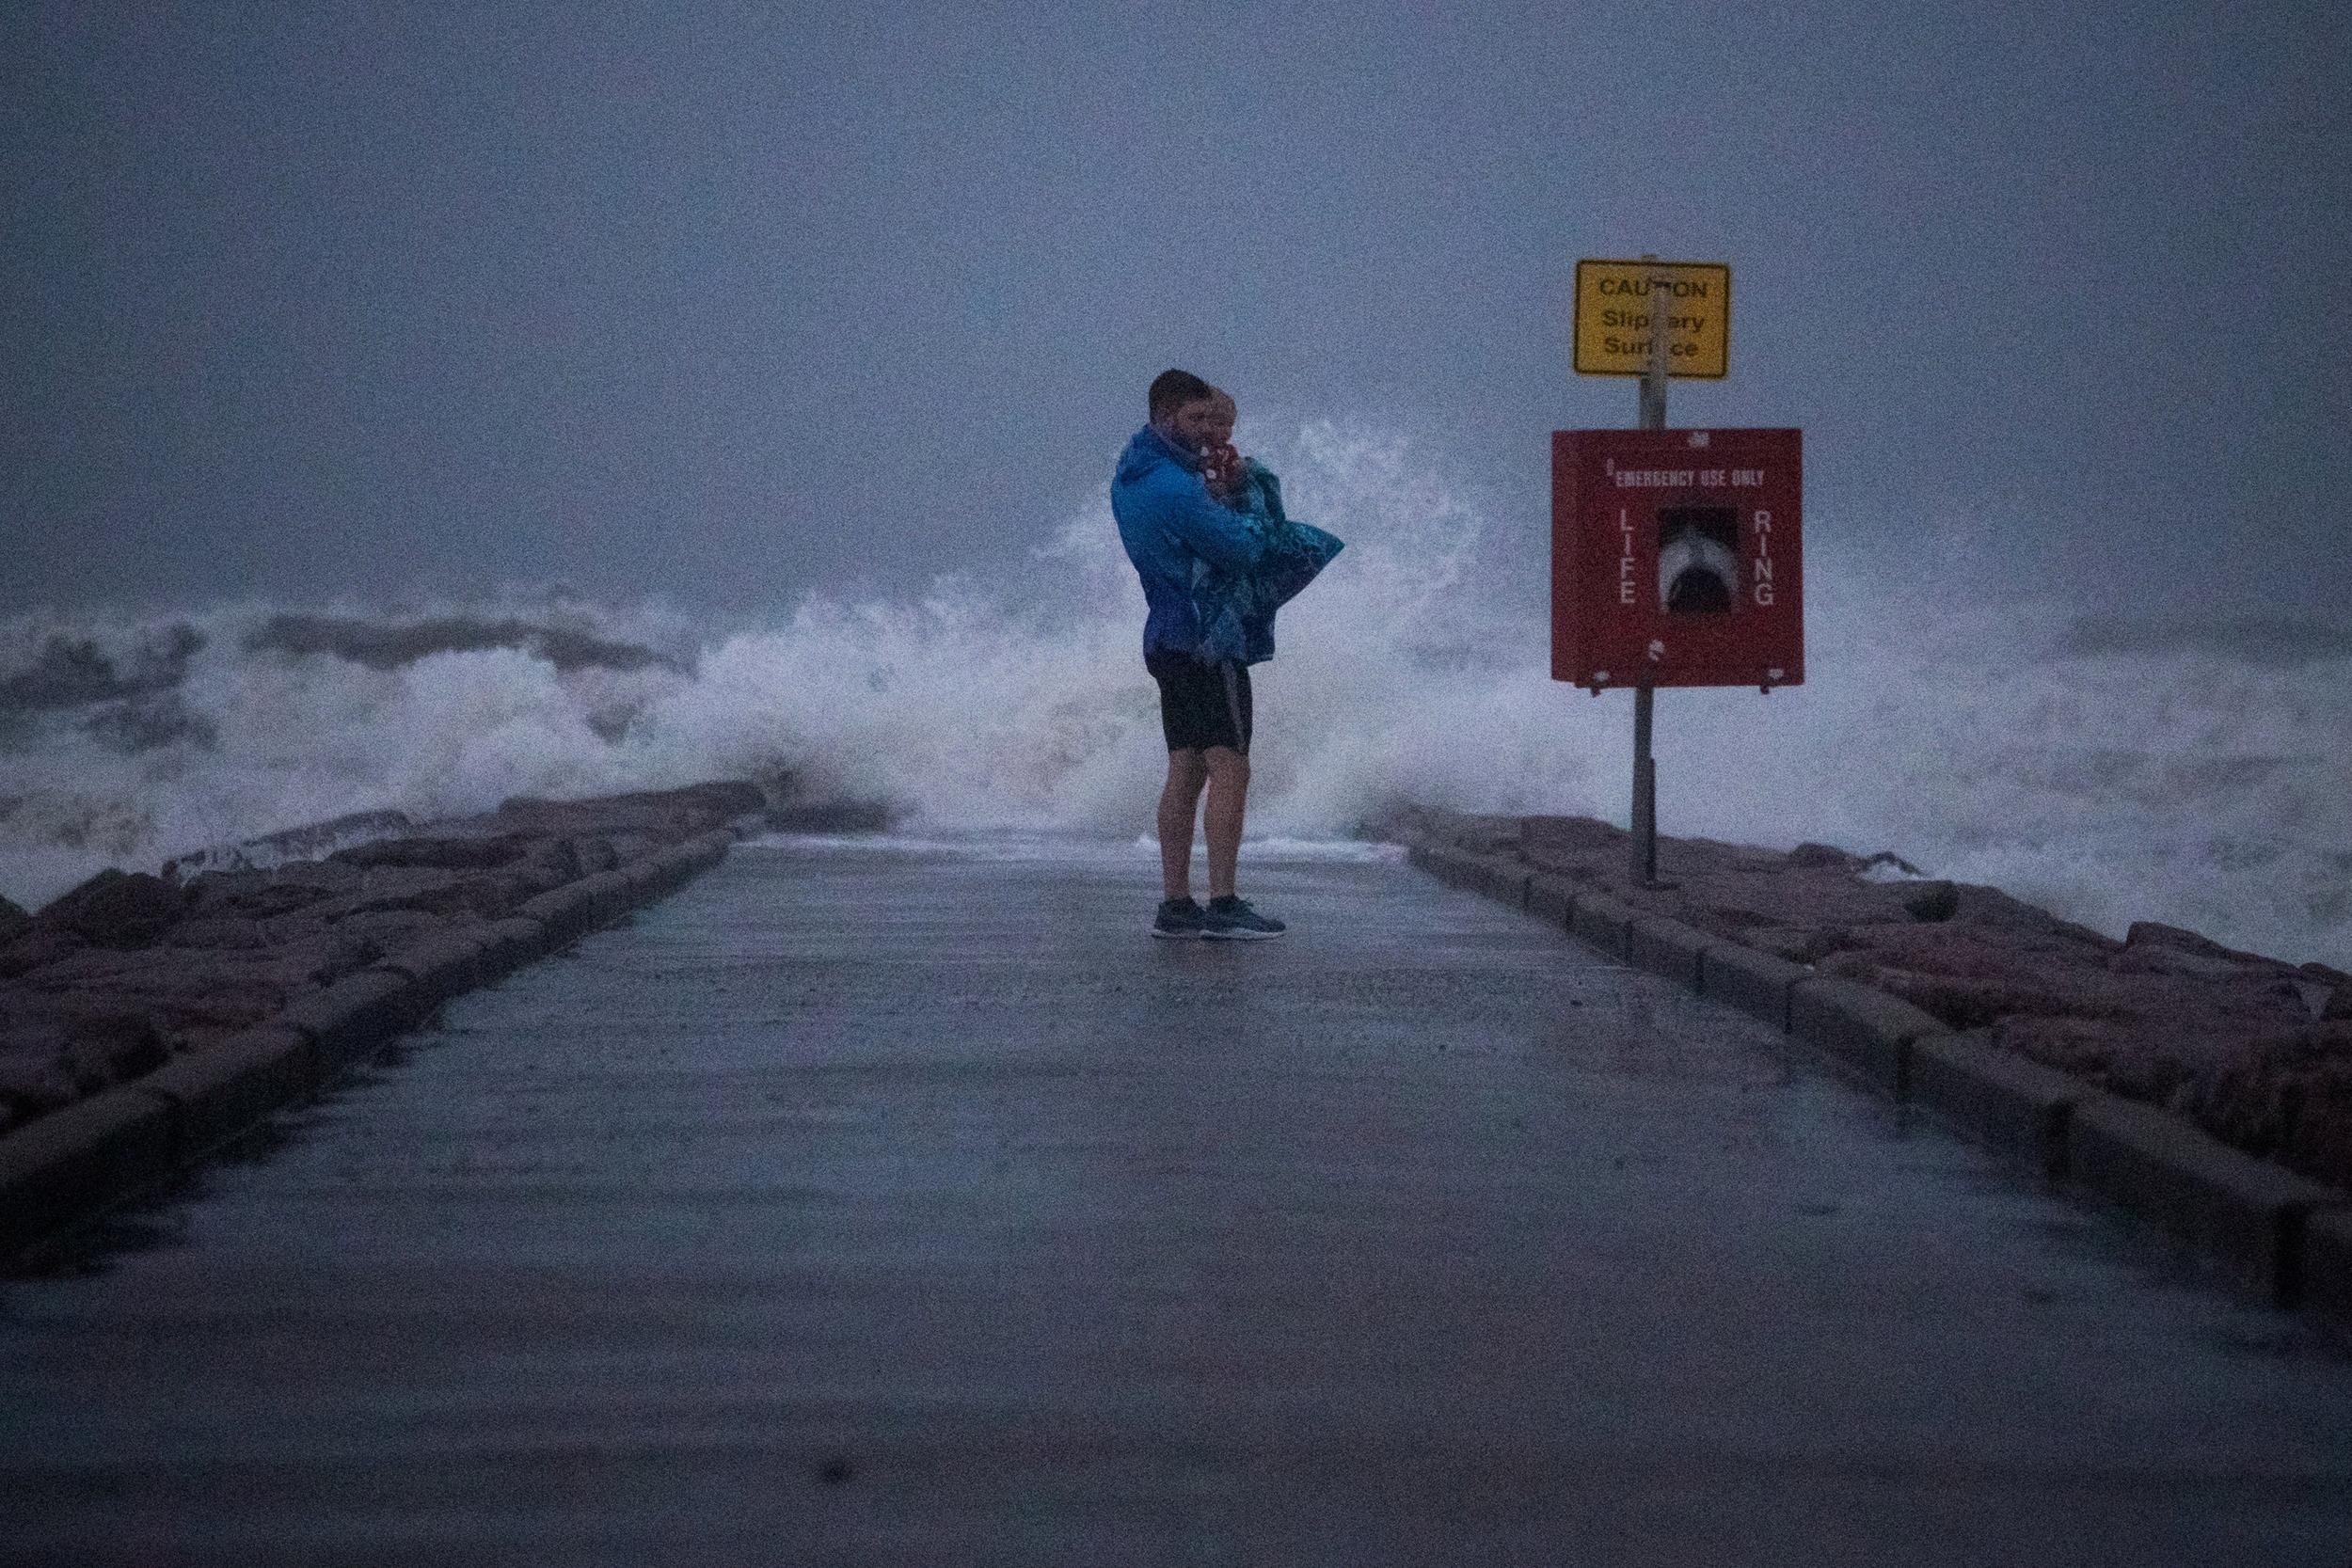 Nicholas, now a tropical storm, hits Texas coast with heavy rain and flood warnings